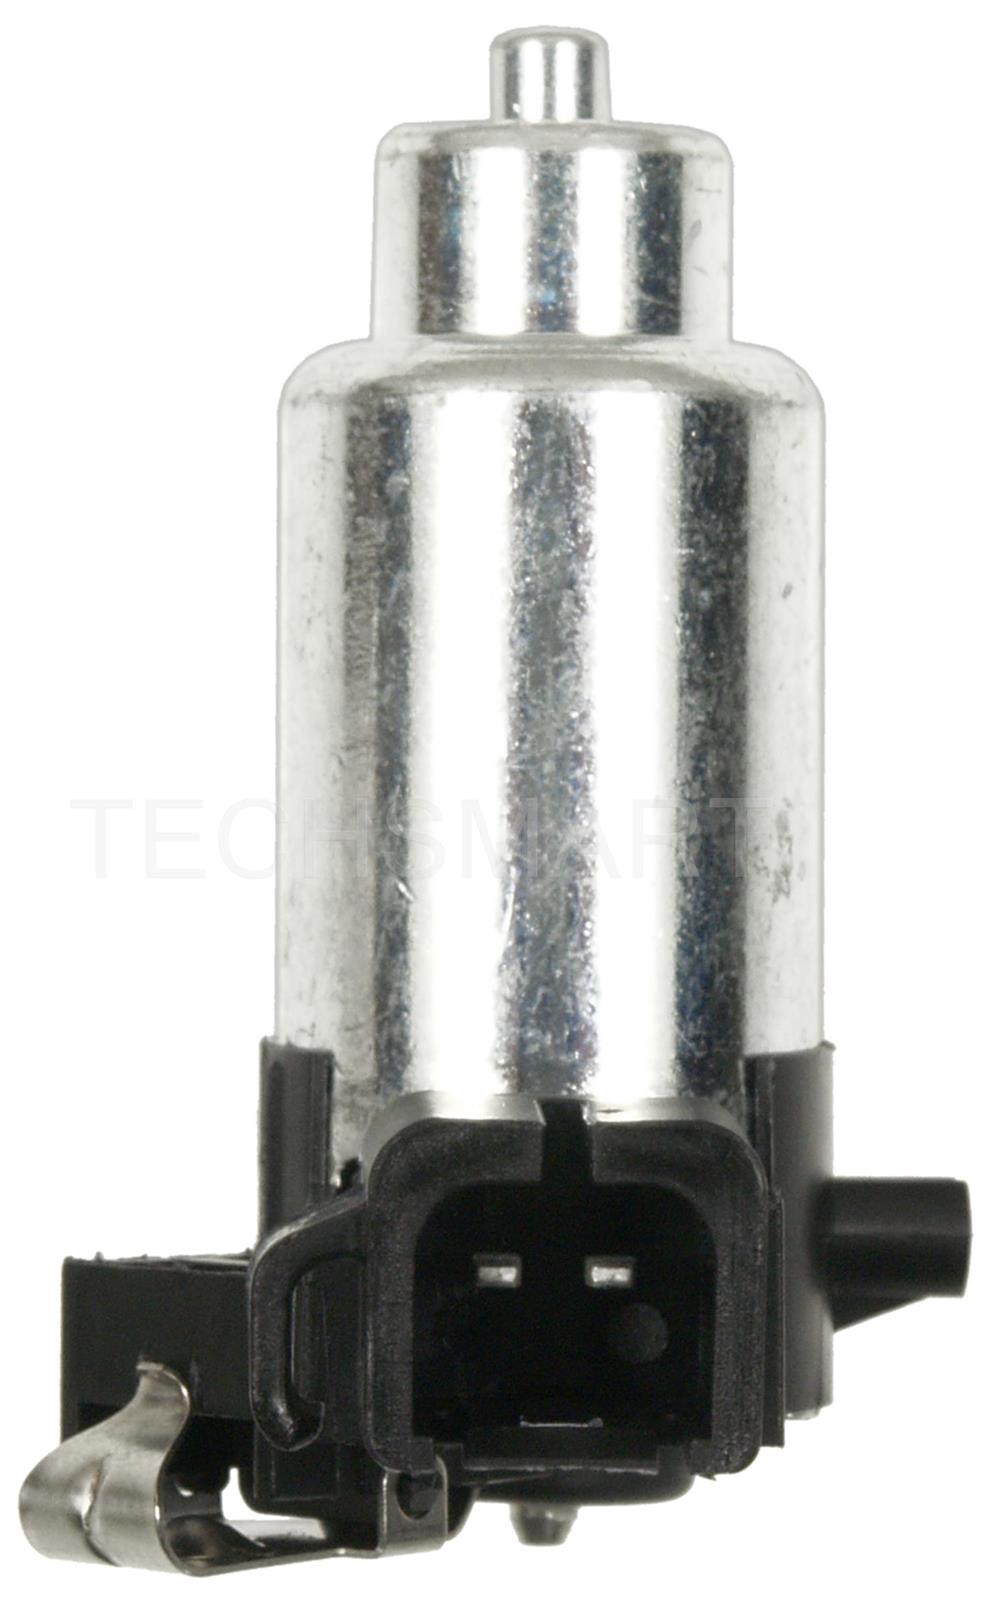 Standard Motor Products C05001 Shift Interlock Actuator